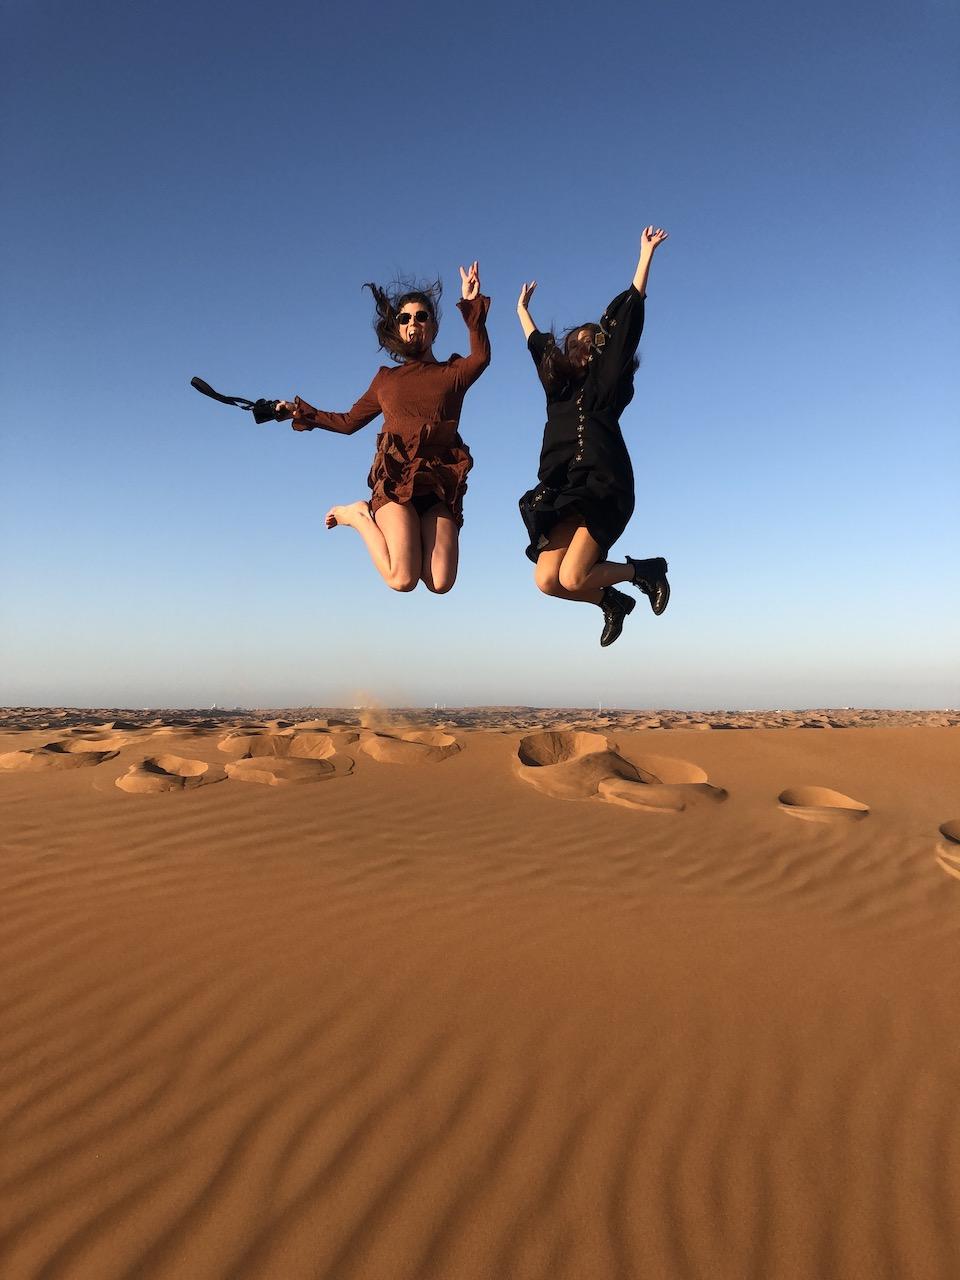 Vakantie Ras Al Khaimah tips - Al Wadi Desert - Chloe Sterk - Amandine Hach